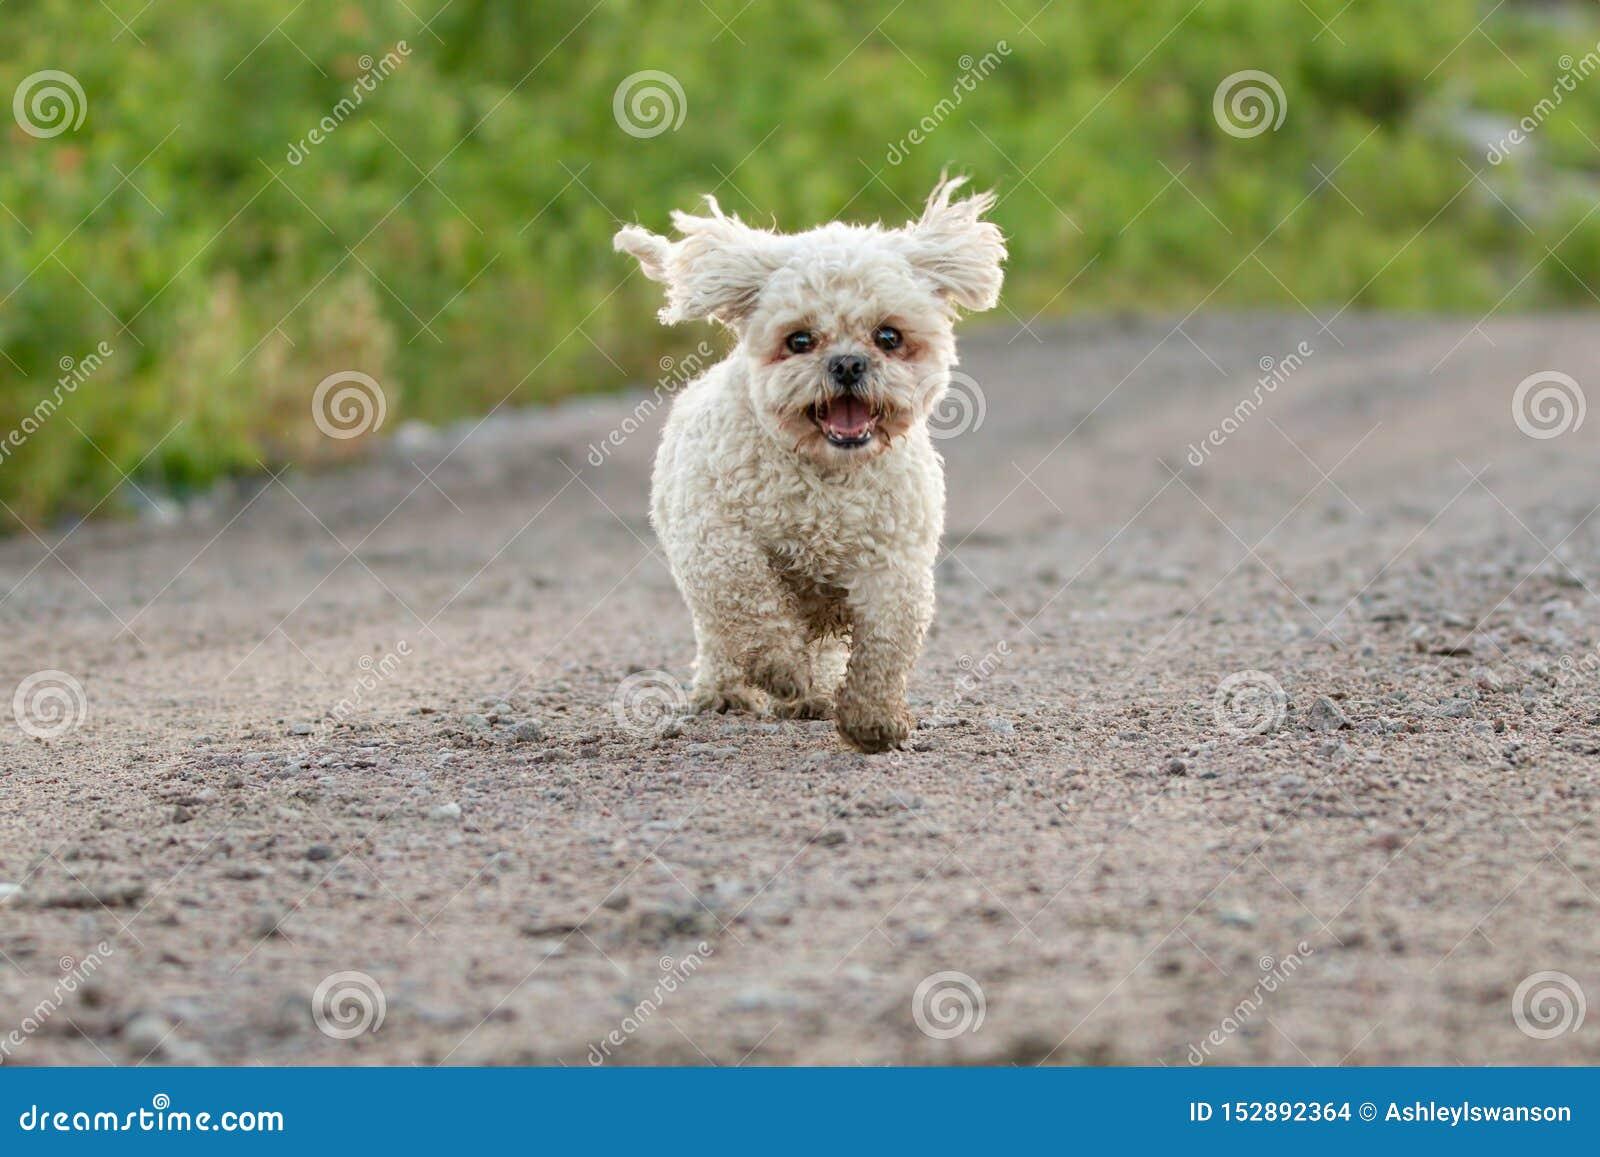 Bichon Frise Shih Tzu Mix Running Outside in Summer